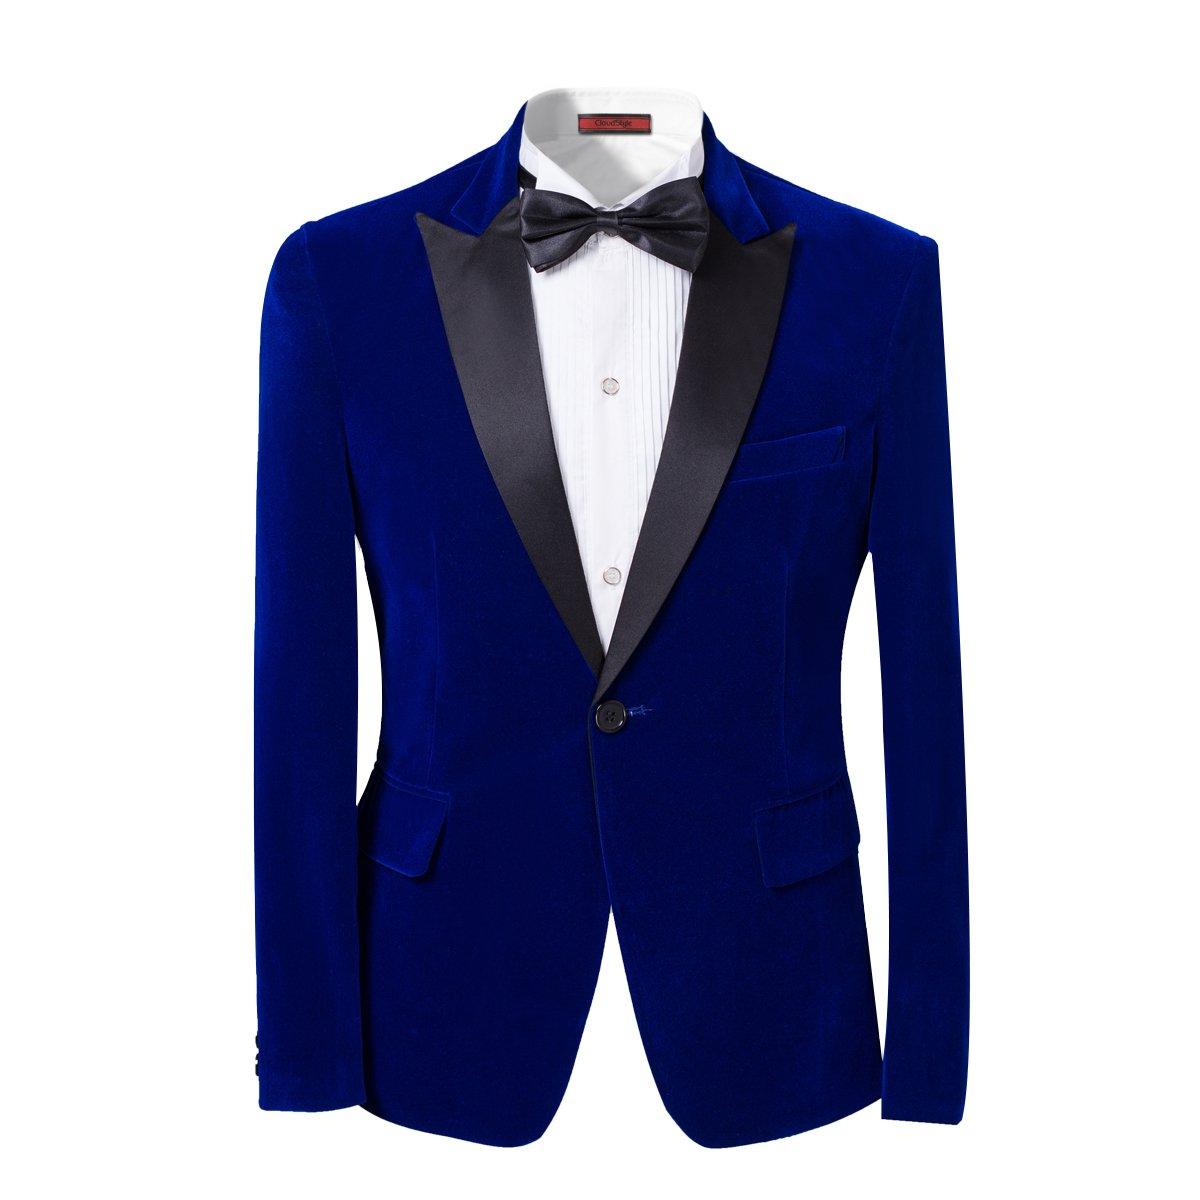 Mens 2-piece Suit Peaked Lapel One Button Tuxedo Slim Fit Dinner Jacket & Pants,Blue,Large by Cloudstyle